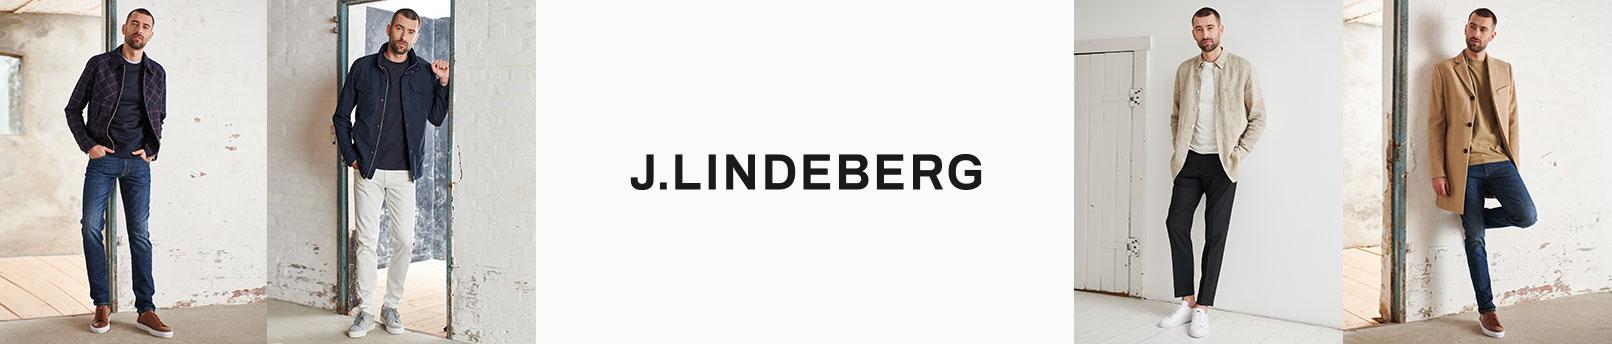 J.LINDEBERG shoppen